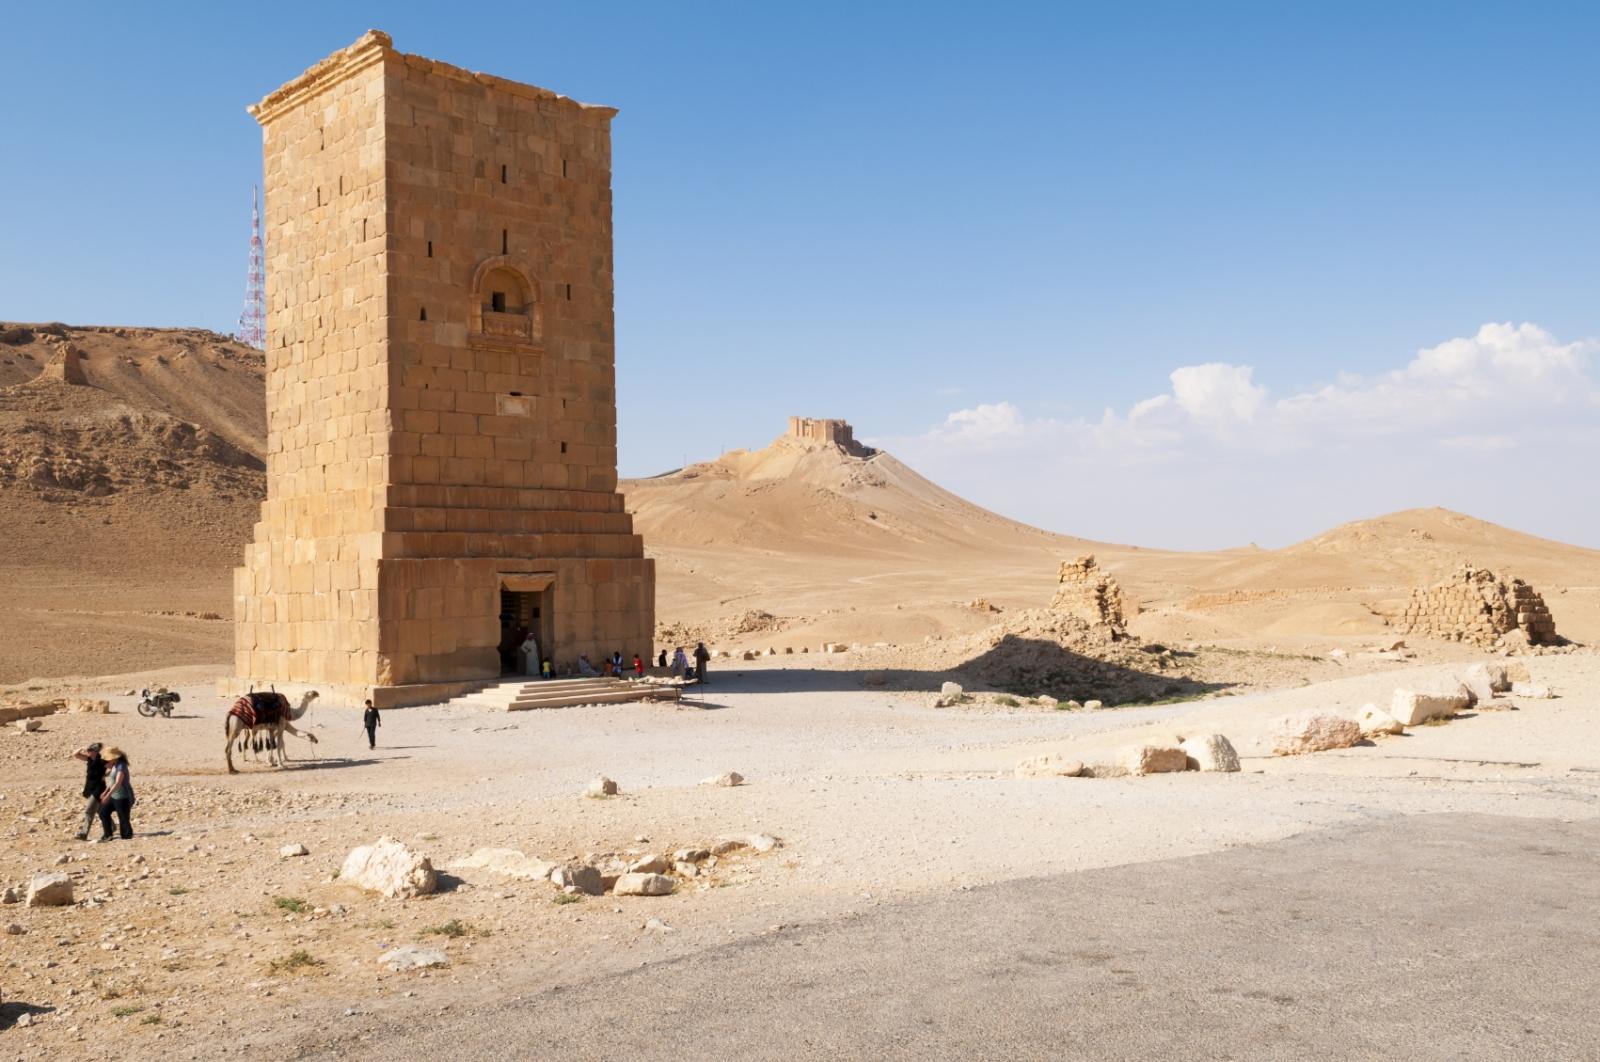 Isis destroys Tomb Tower of Elahbel Palmyra